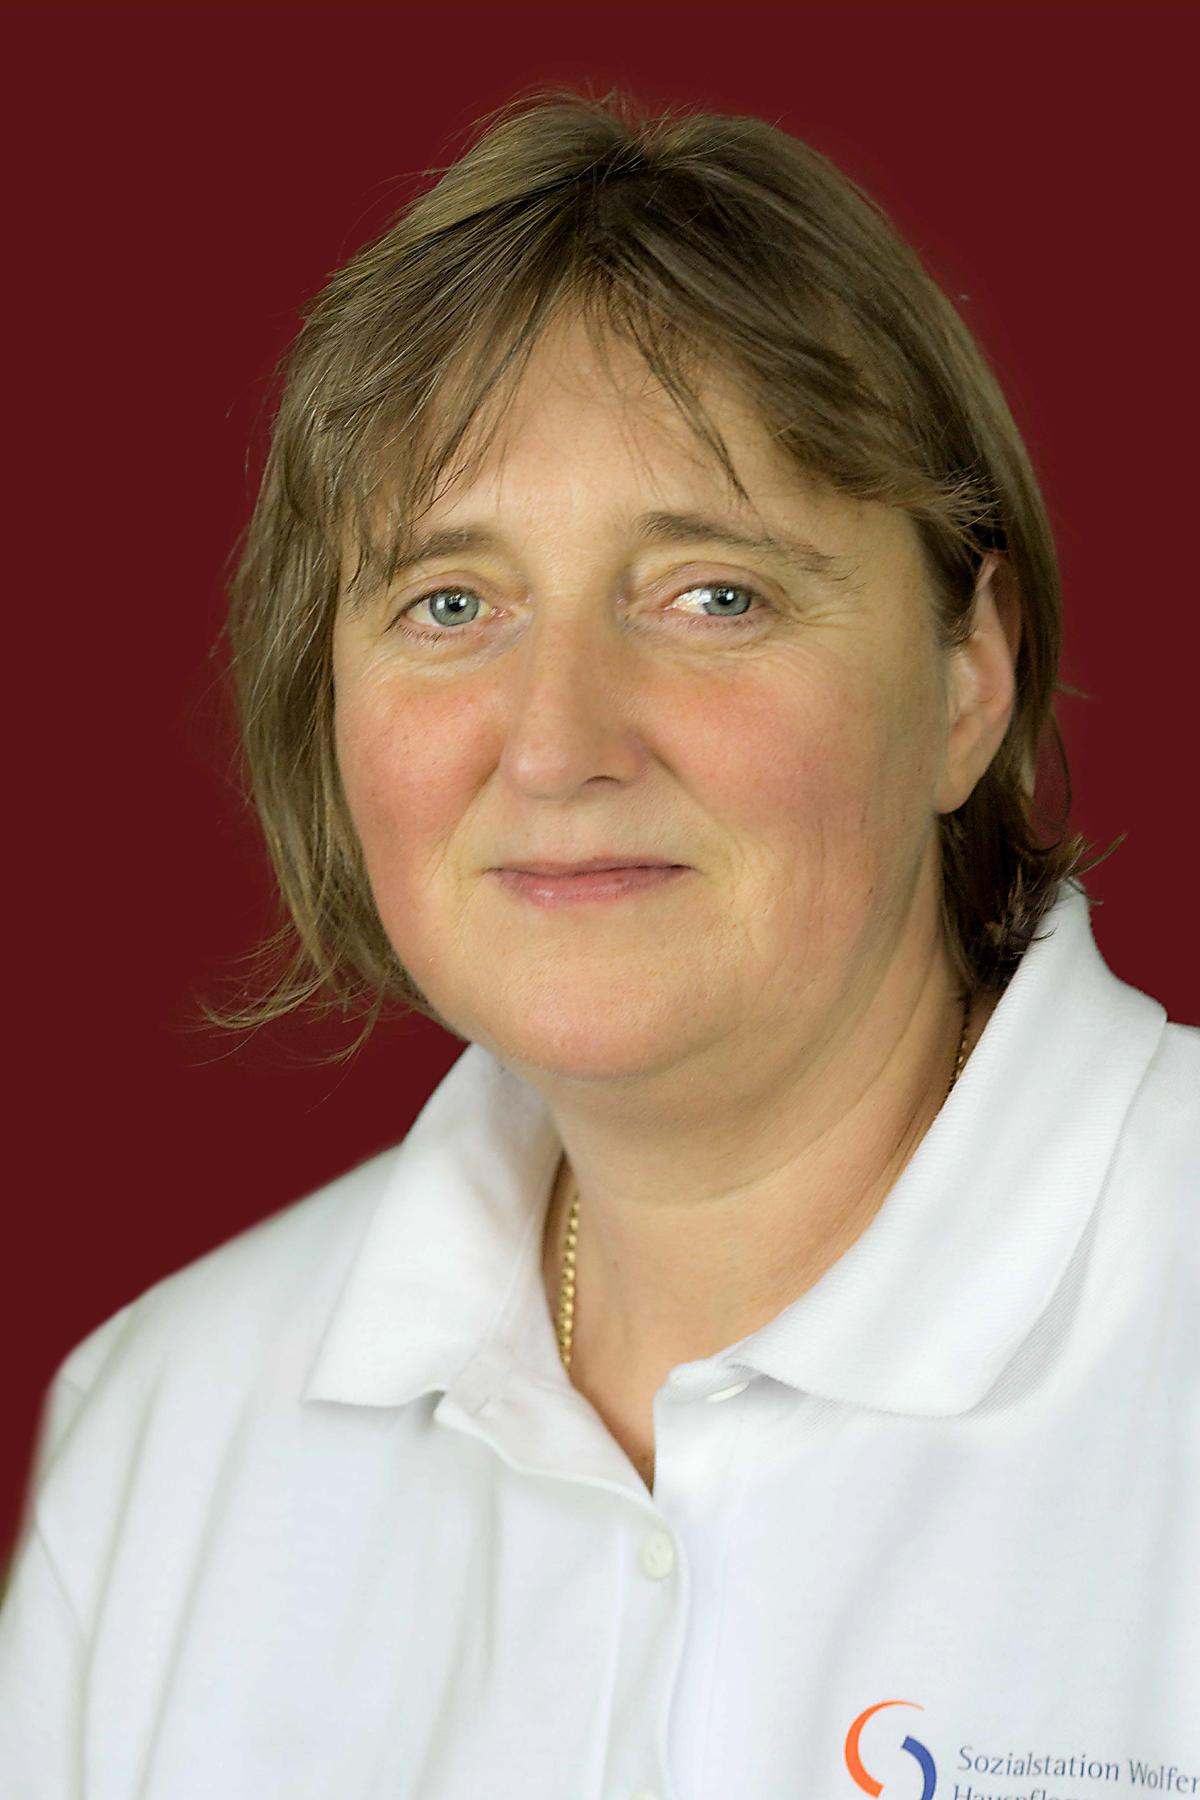 E. Rettberg